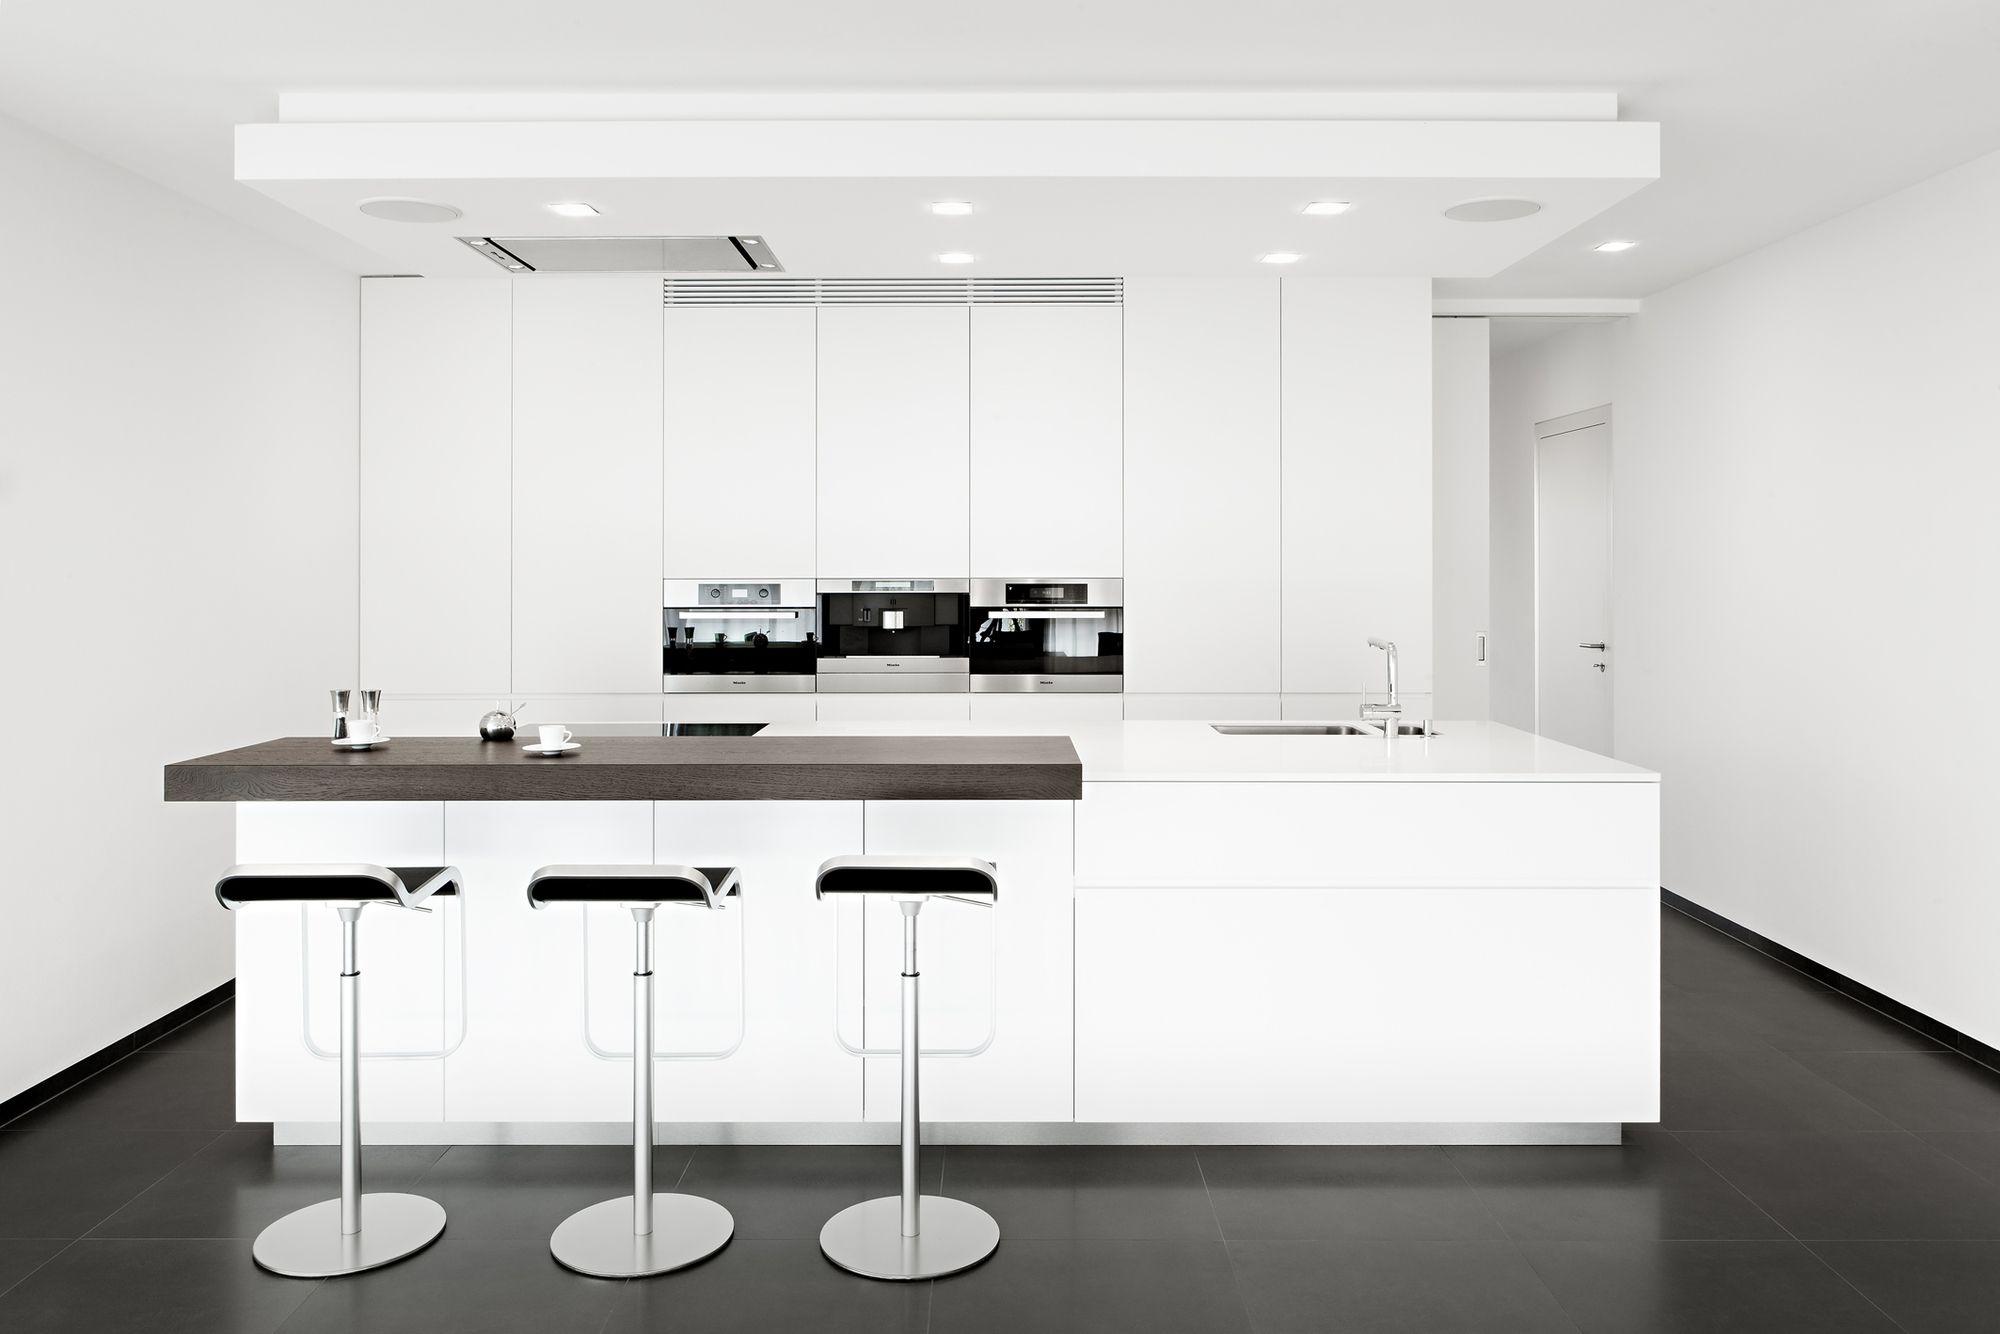 m2-house-monovolume-architecture-design_villa_moritzing_15